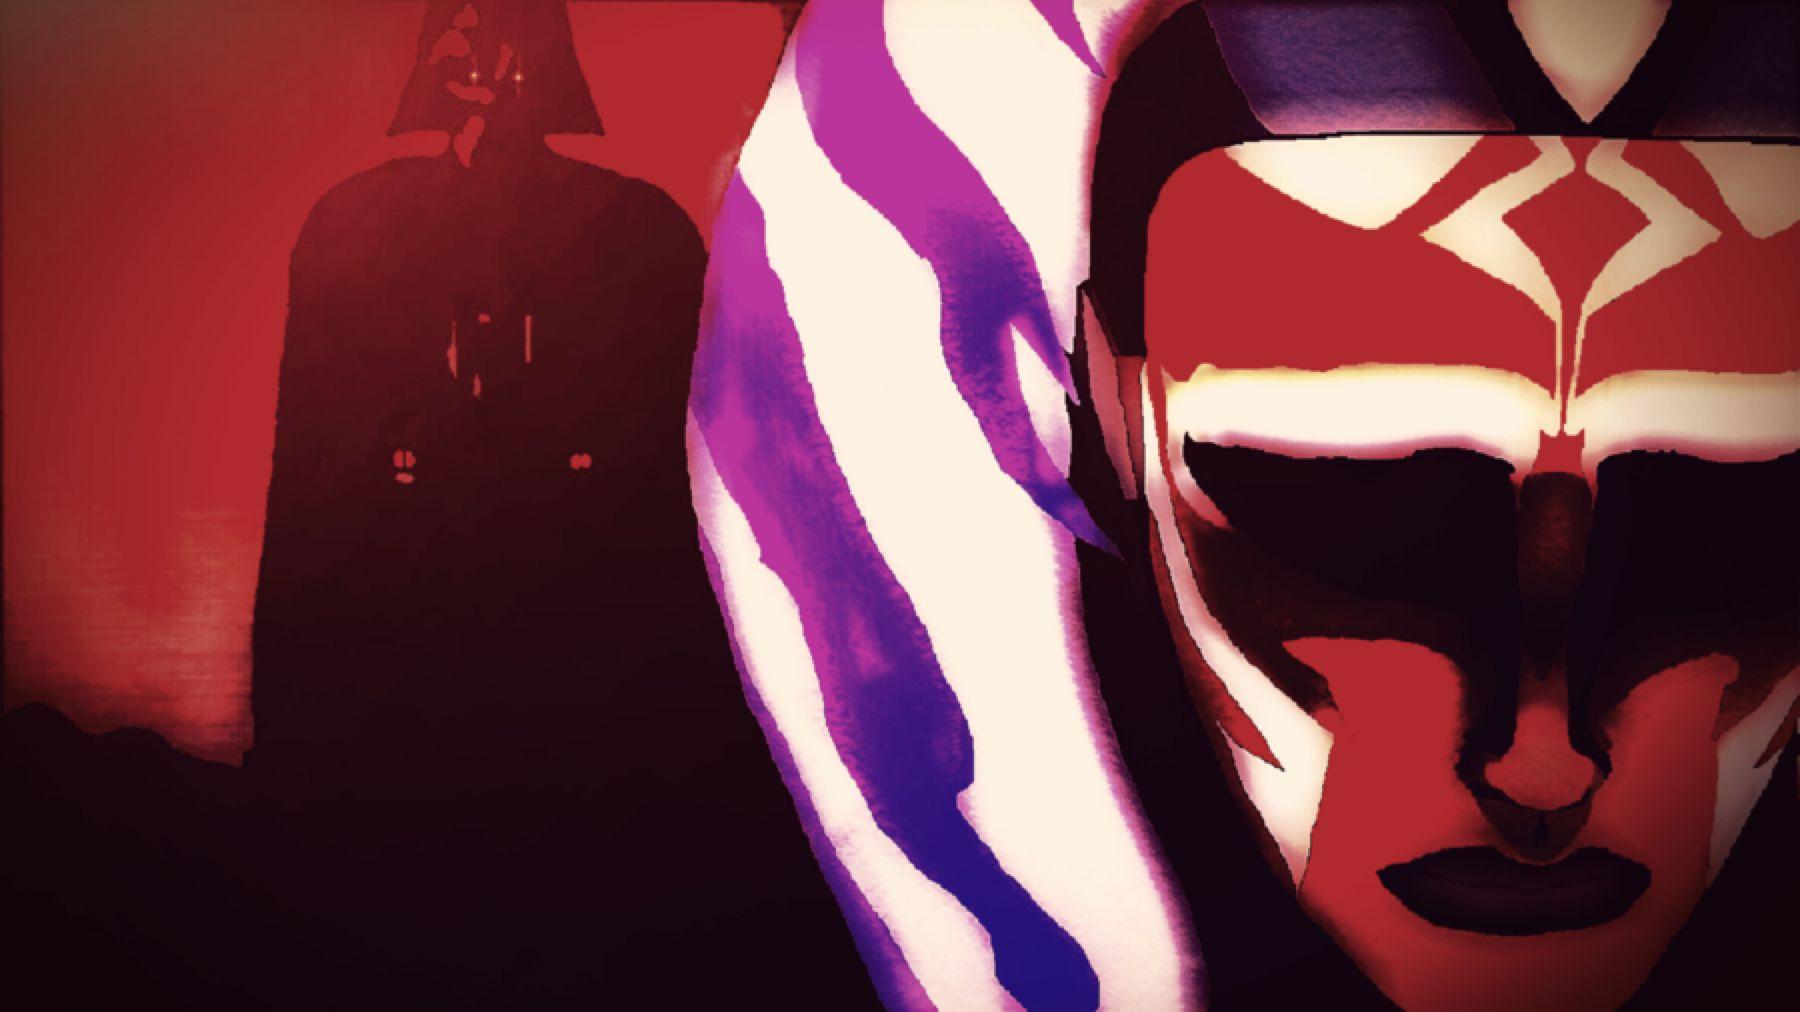 Twilight of the Apprentice Darth Vader & Ahsoka Tano Star